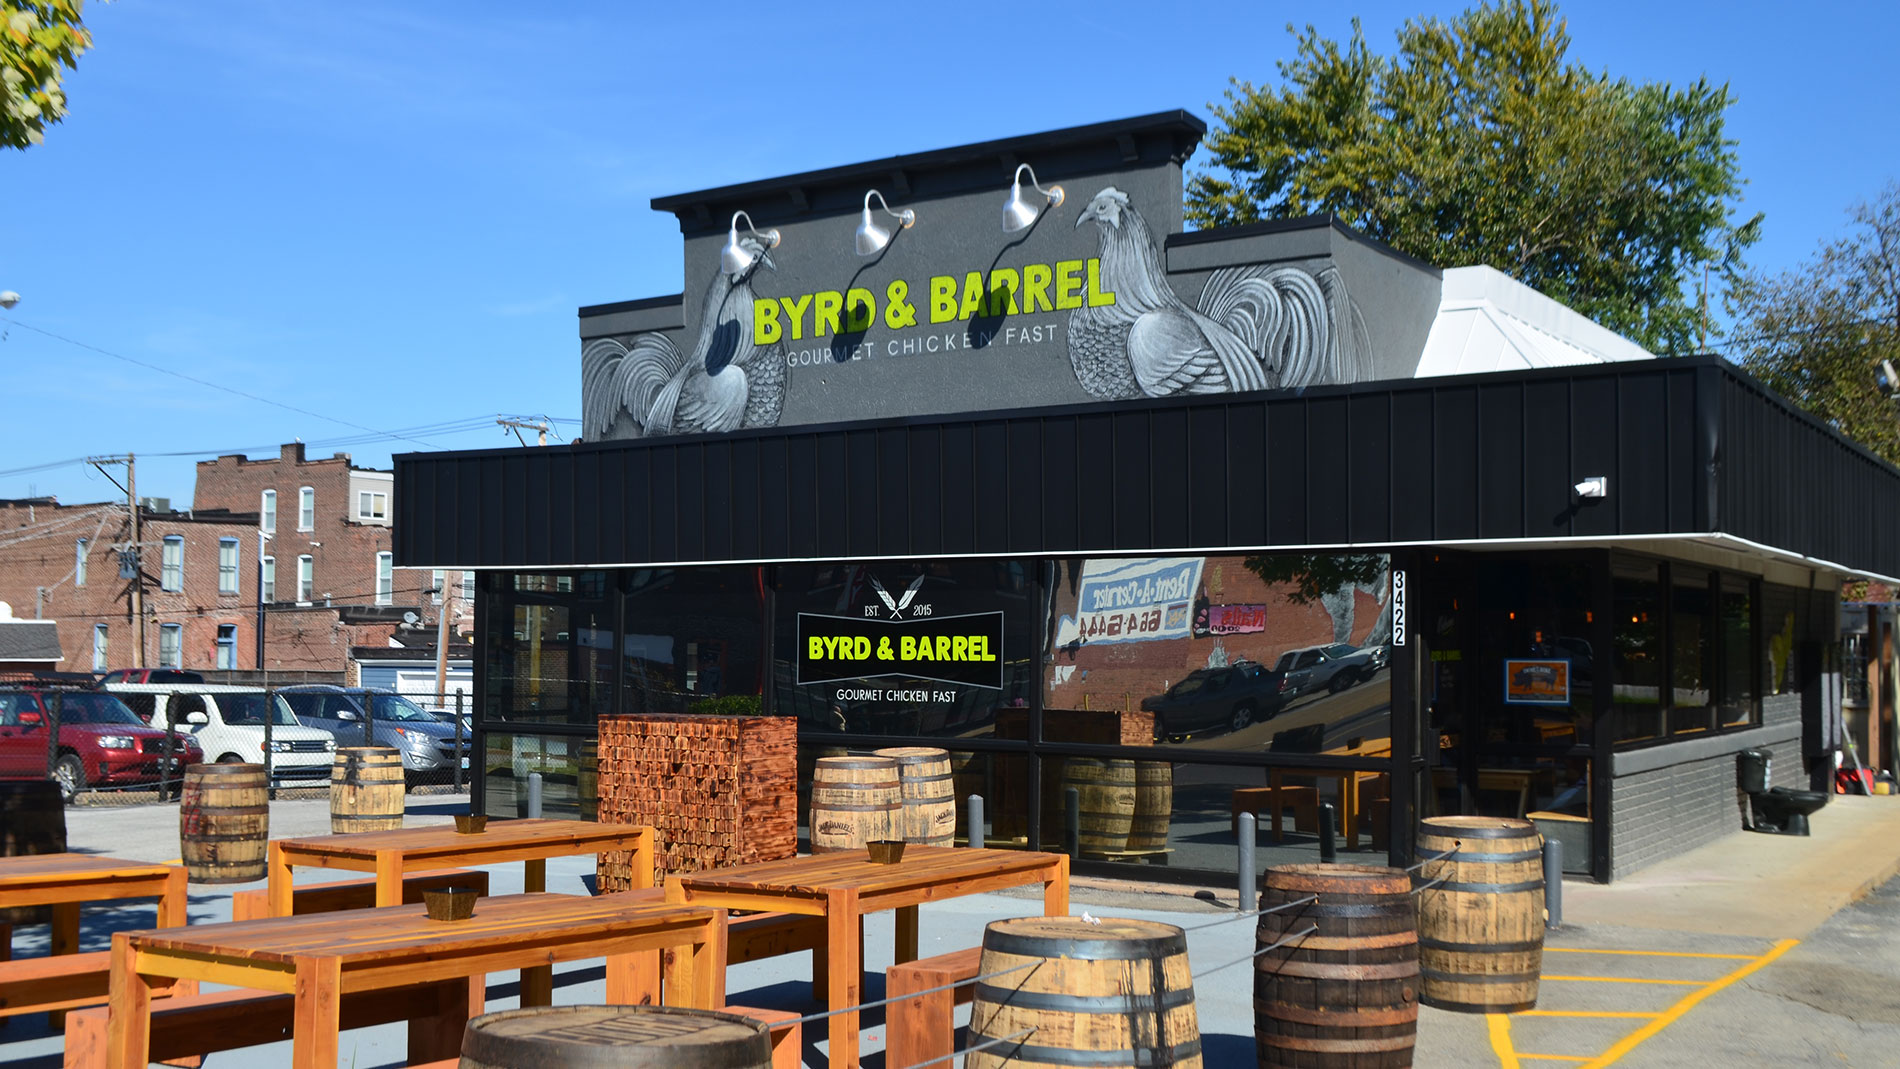 byrd & barrel's original location off cherokee street in st. louis